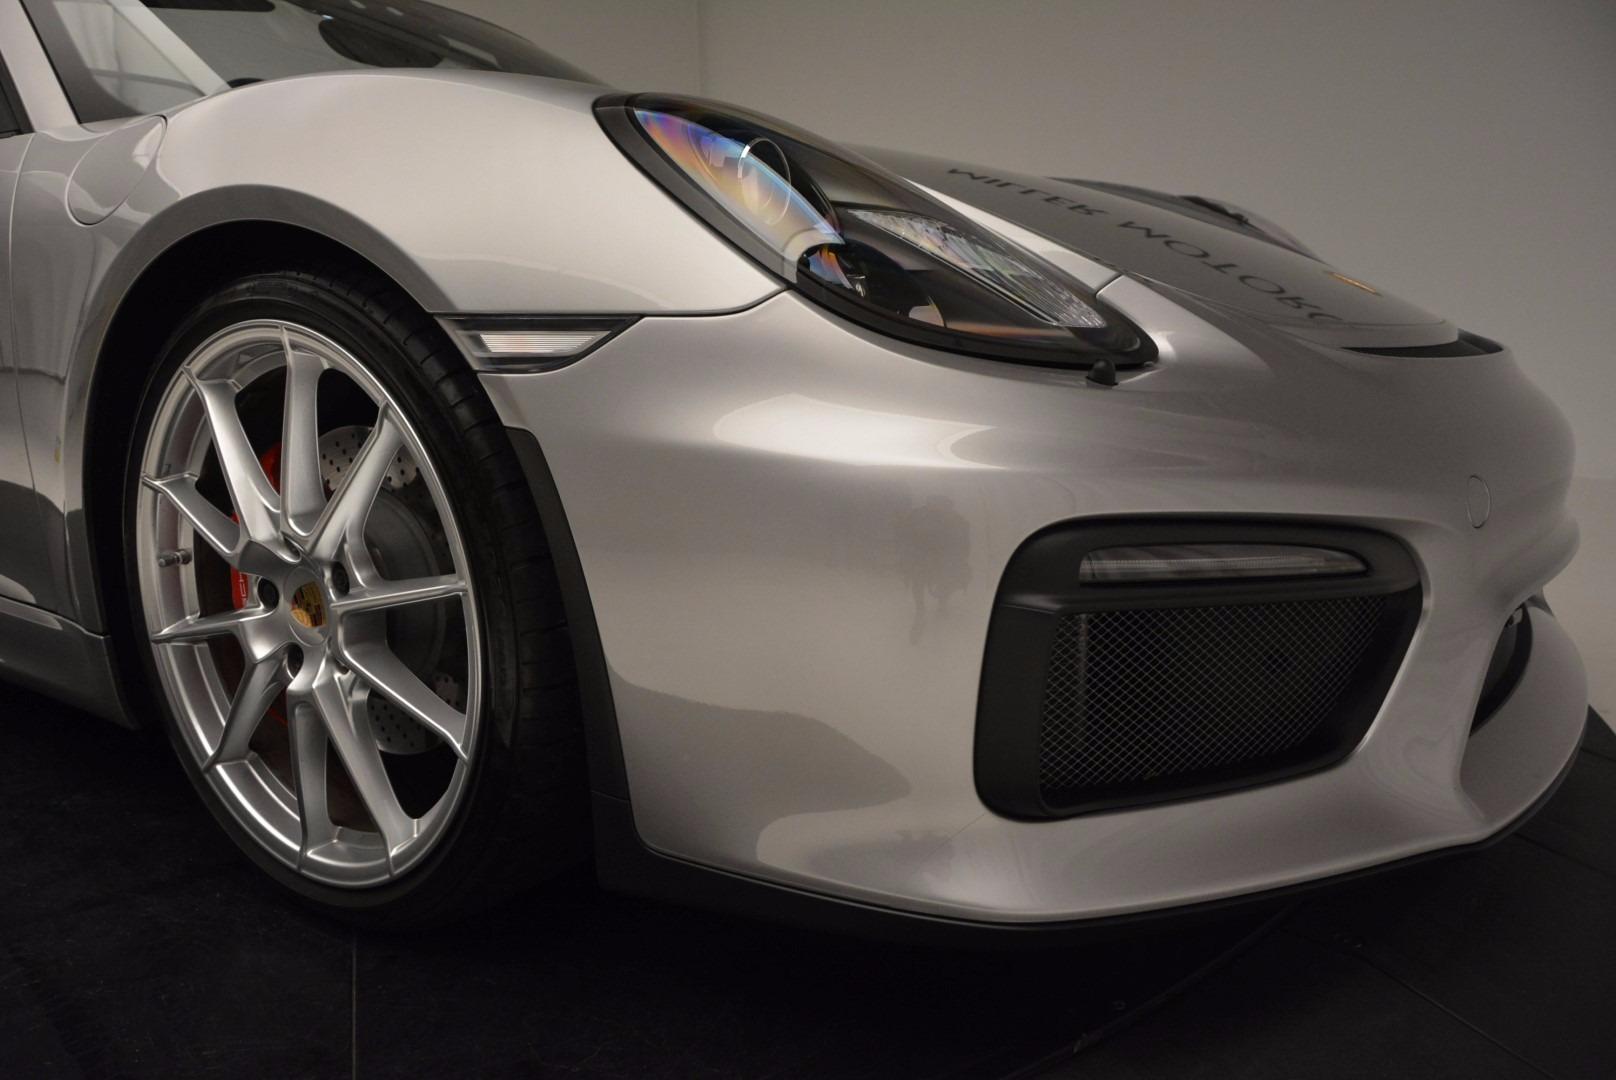 Used 2016 Porsche Boxster Spyder For Sale In Greenwich, CT. Alfa Romeo of Greenwich, 4307A 718_p26